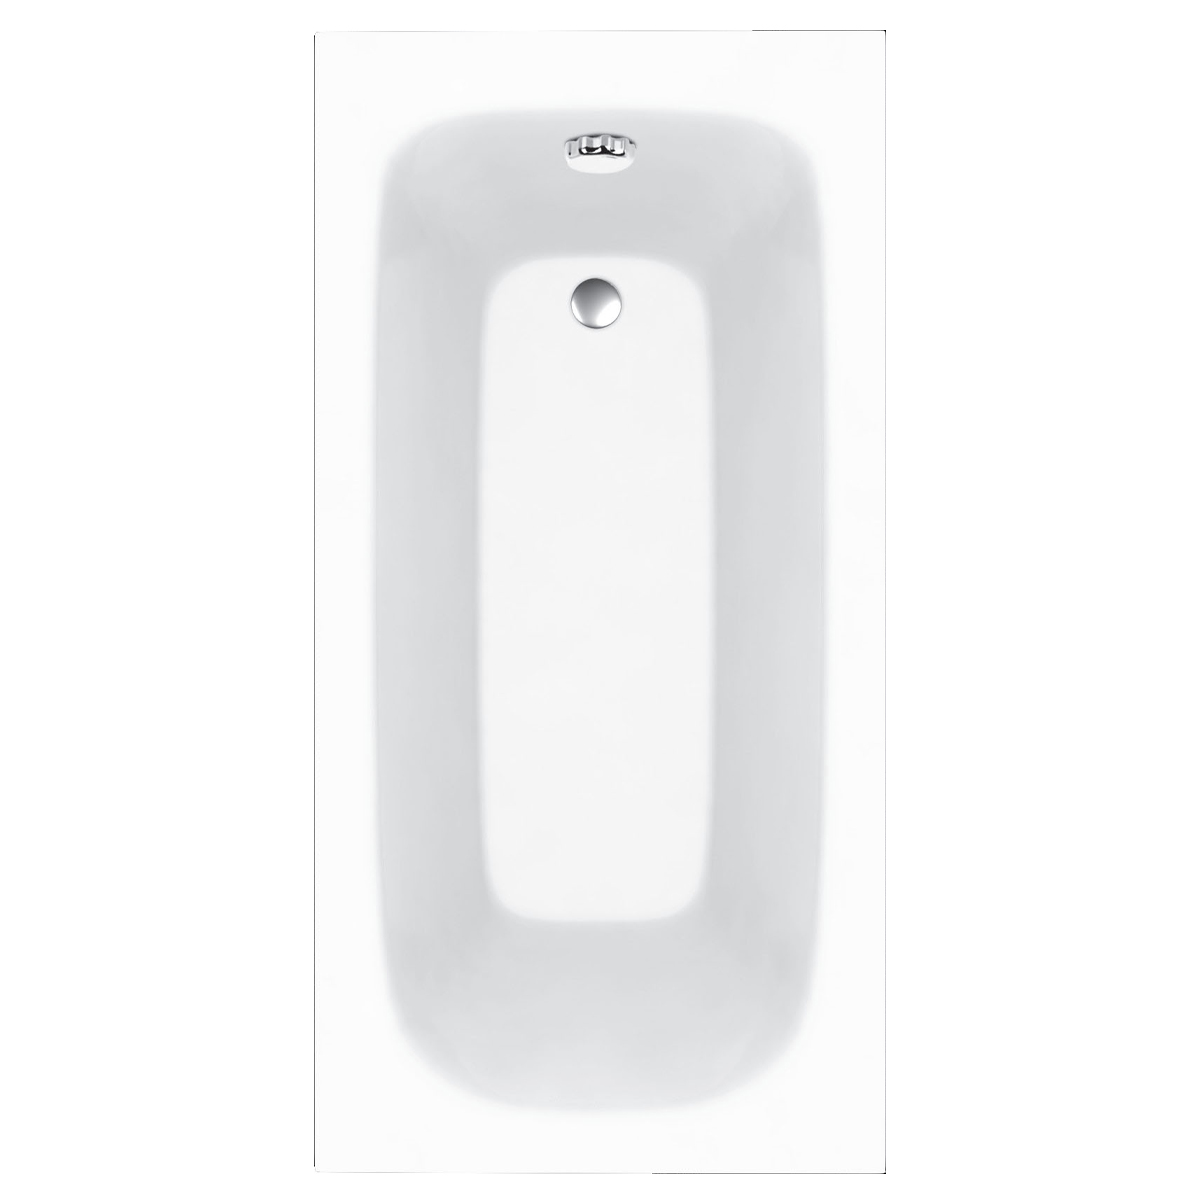 K-Vit G4K 1700 x 700 Contract Bath